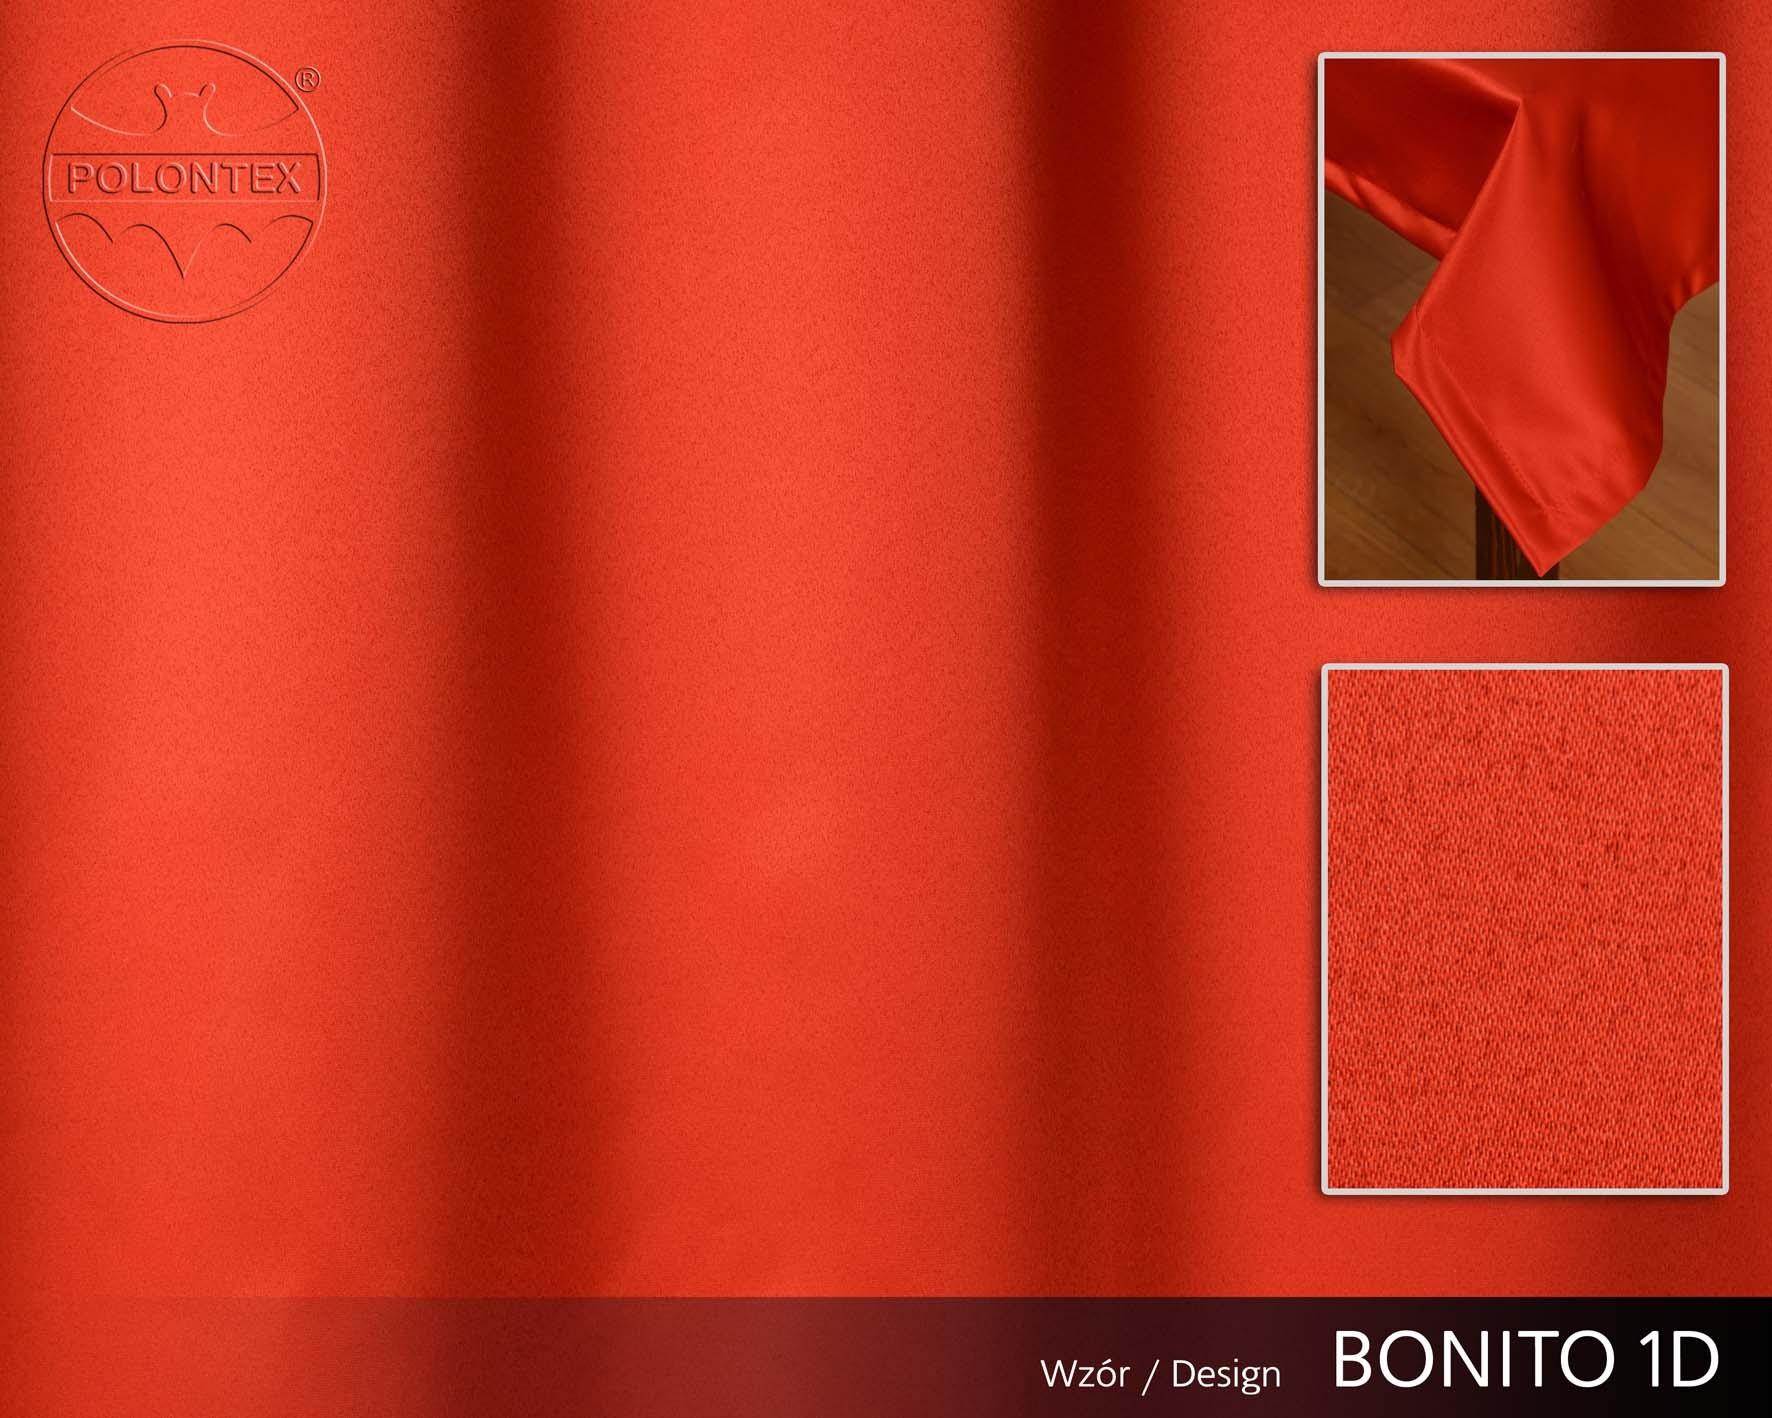 Bonito 1D 3399